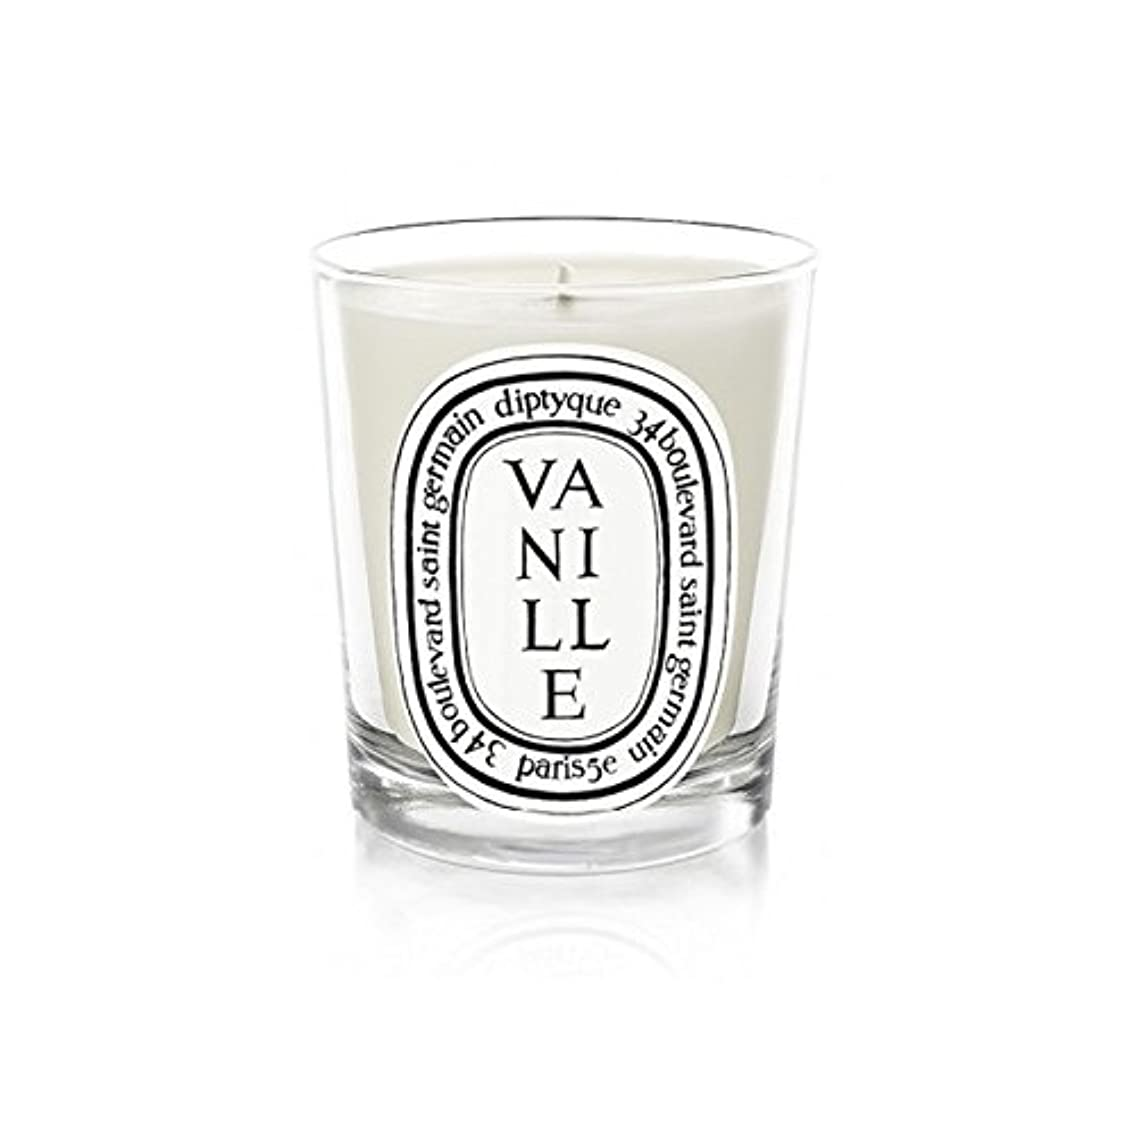 Diptyque Candle Vanille 70g (Pack of 2) - Diptyqueキャンドルバニラの70グラム (x2) [並行輸入品]